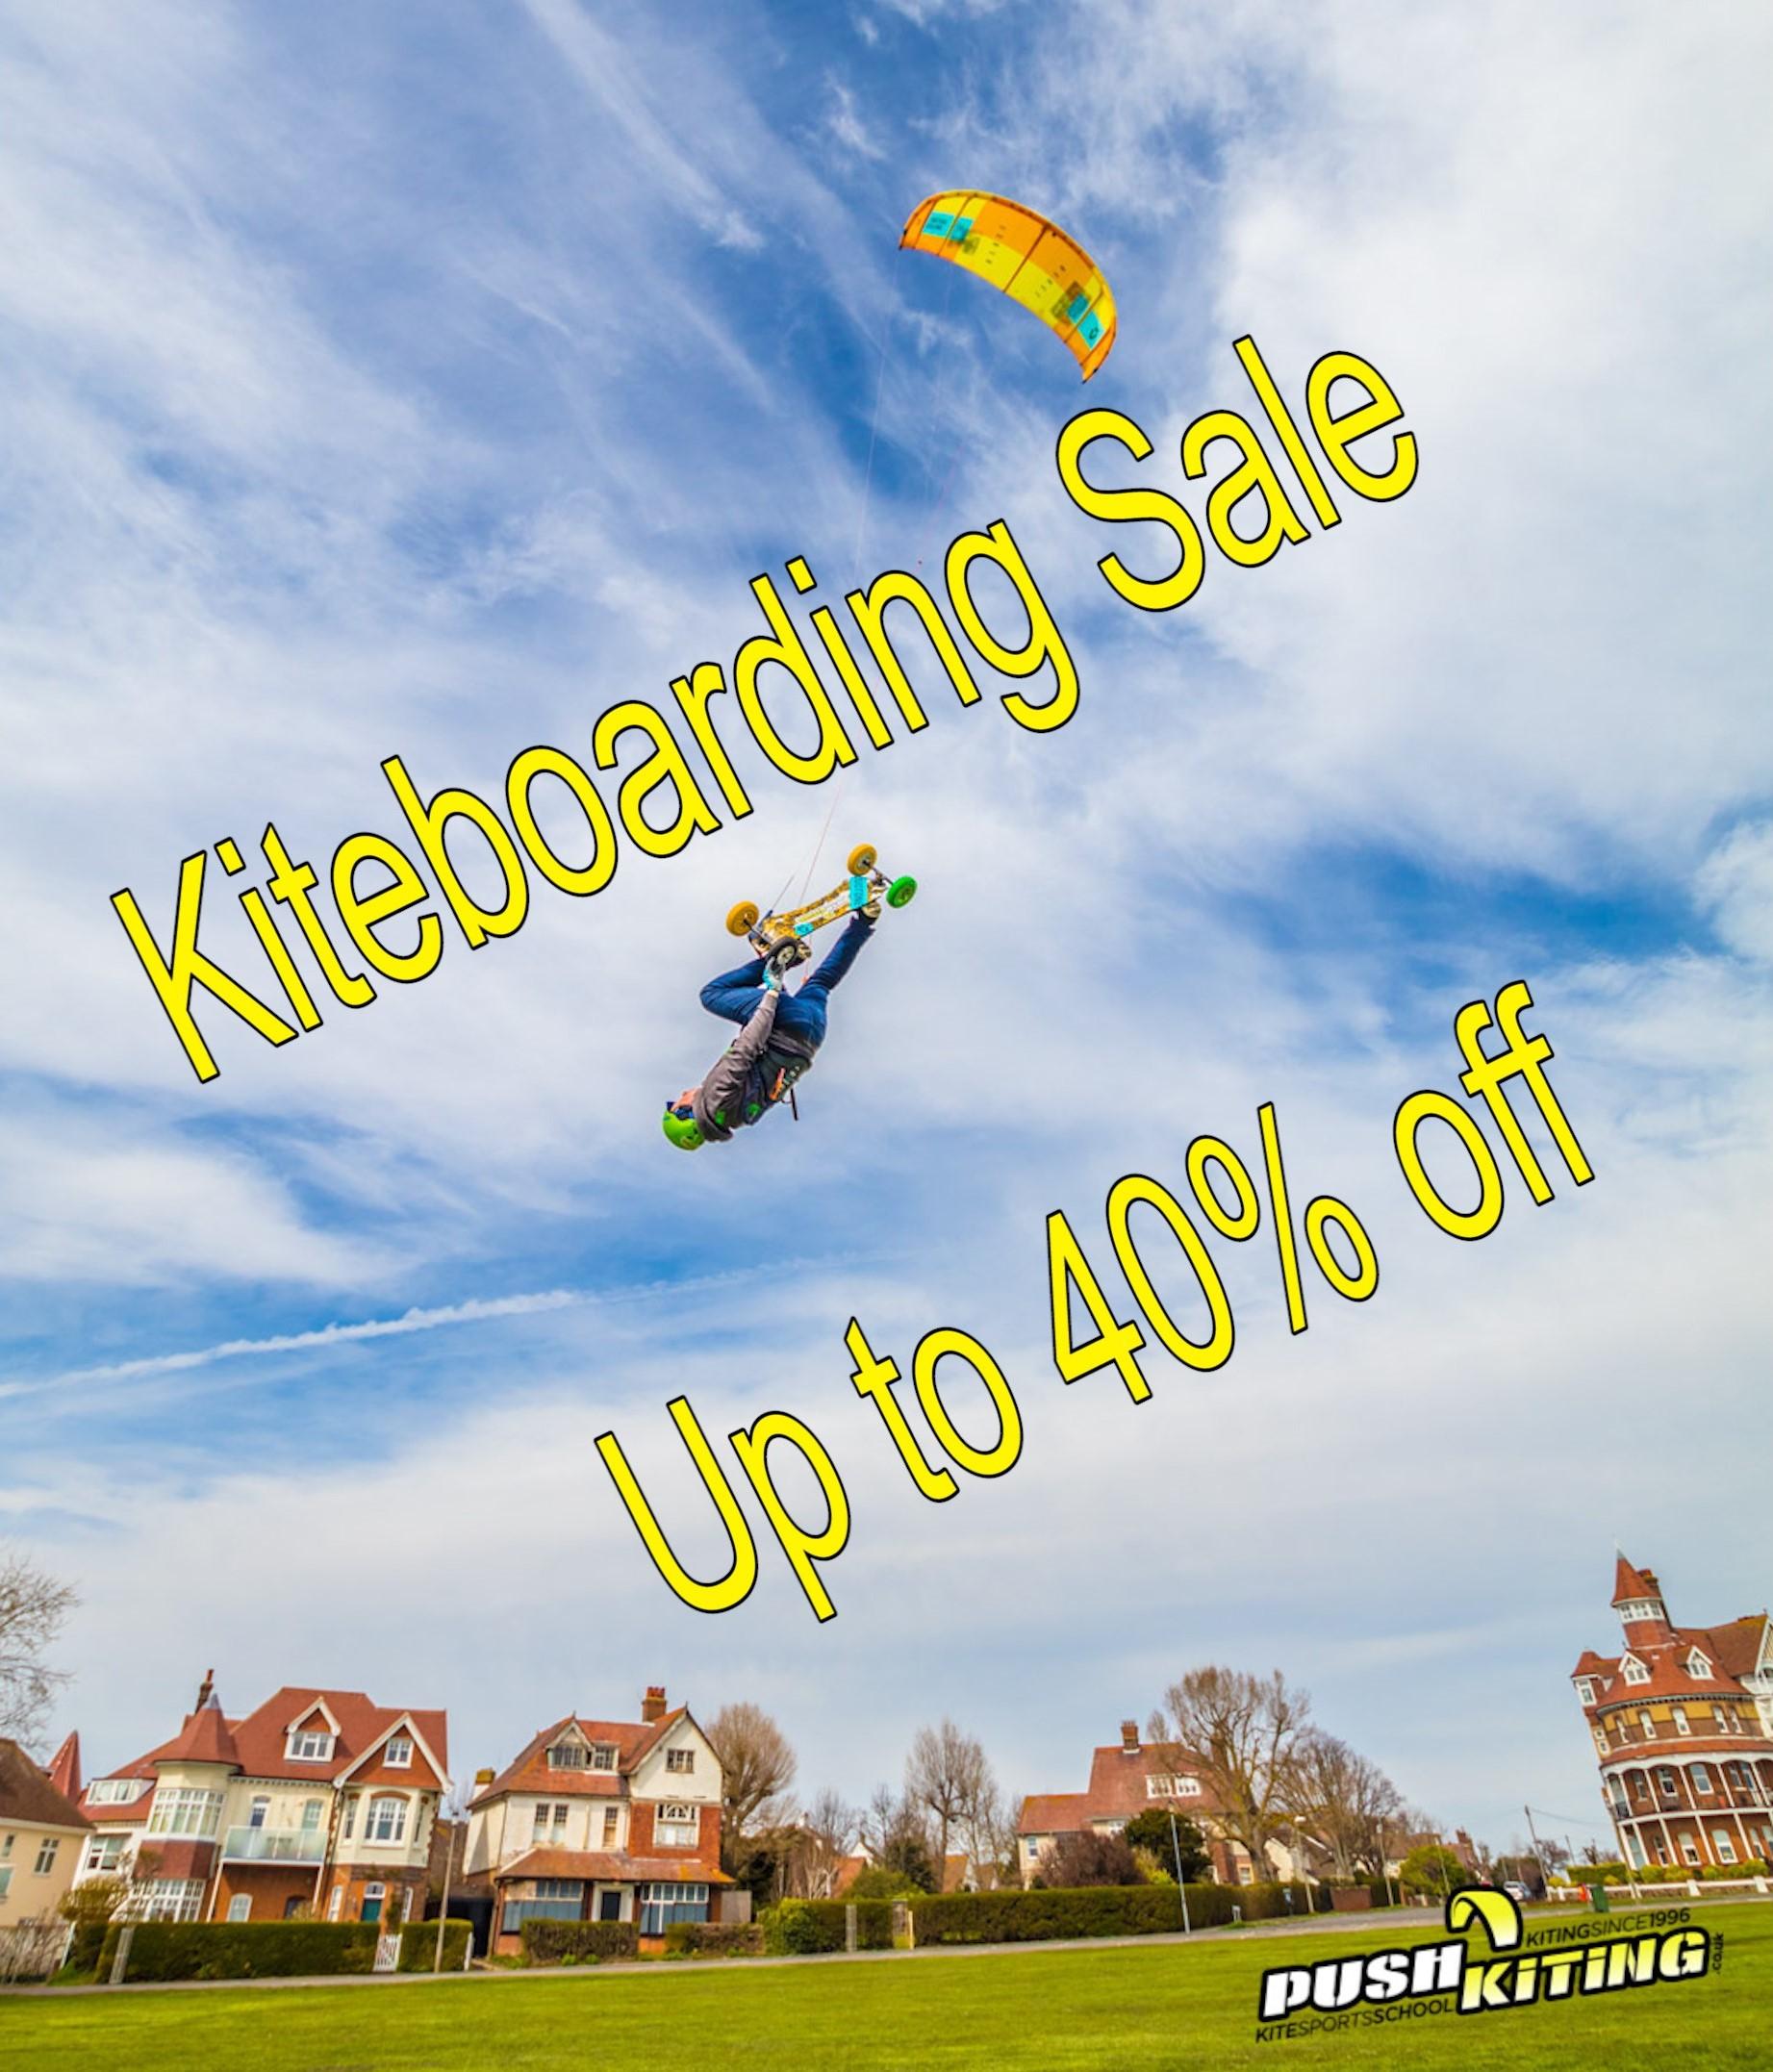 2019 Duotone Kiteboarding kitesurf gear Sale, over 30% off retail prices!